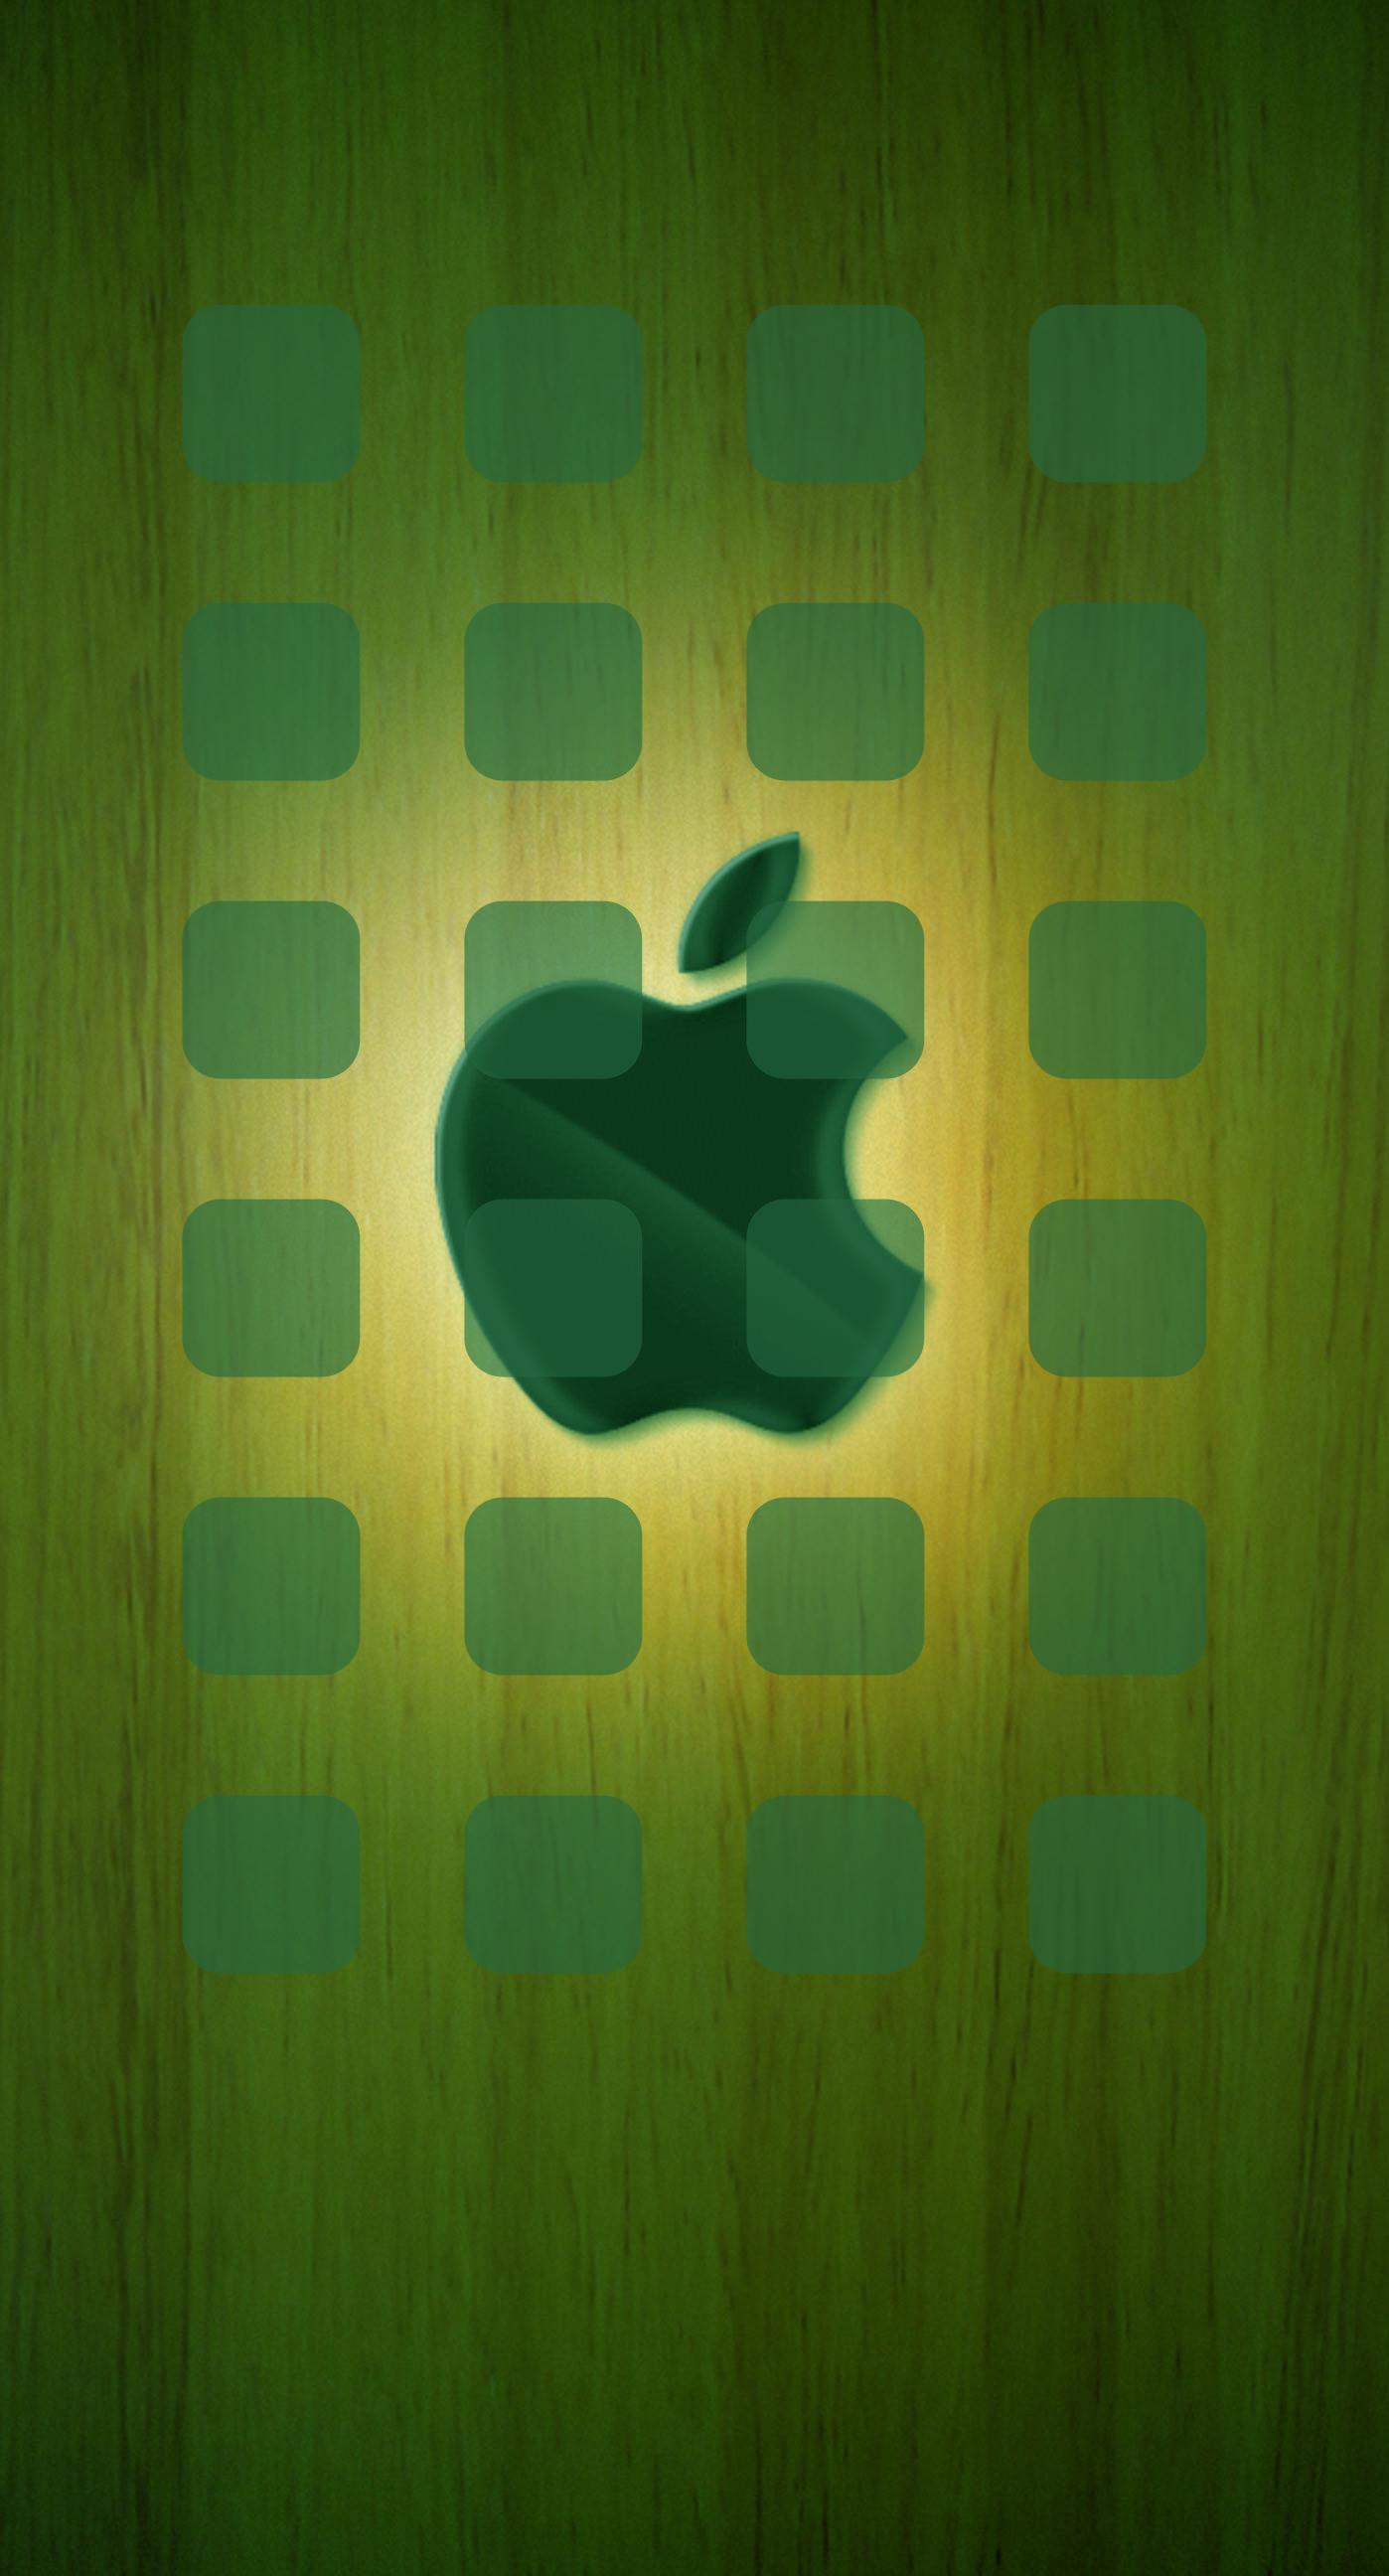 Apple logo shelf cool plate yellow green wallpapersc iPhone7Plus 1398x2592